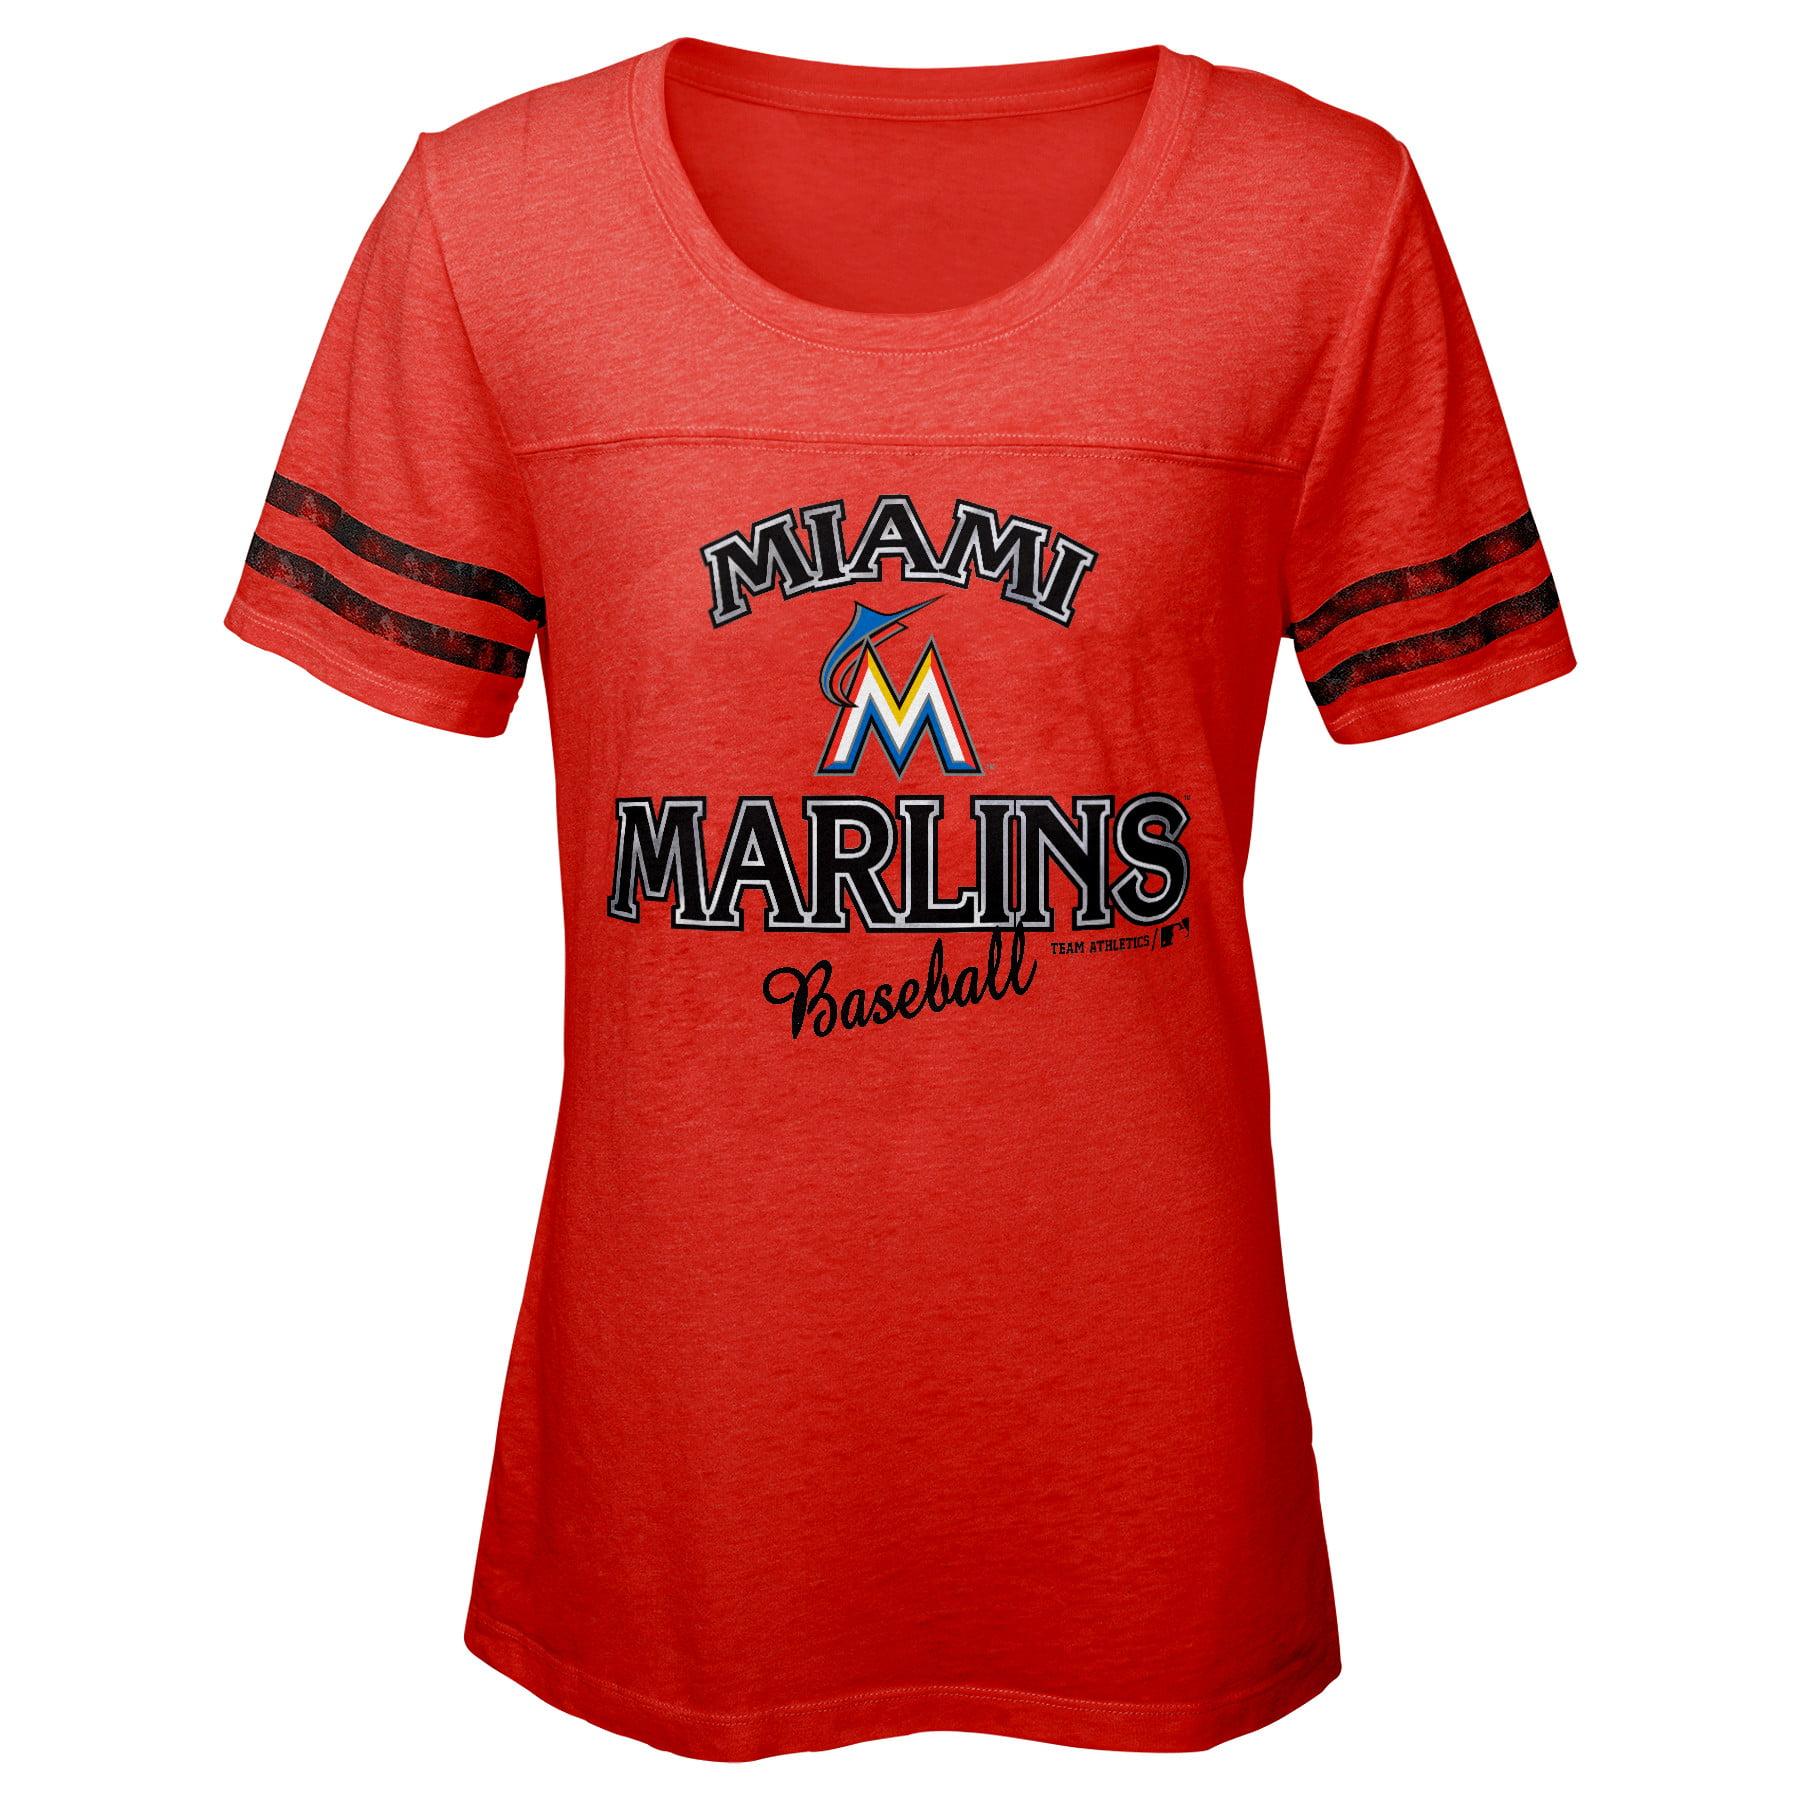 MLB Miami MARLINS TEE Short Sleeve Girls Fashion 60% Cotton 40% Polyester Alternate Team Colors 7 - 16